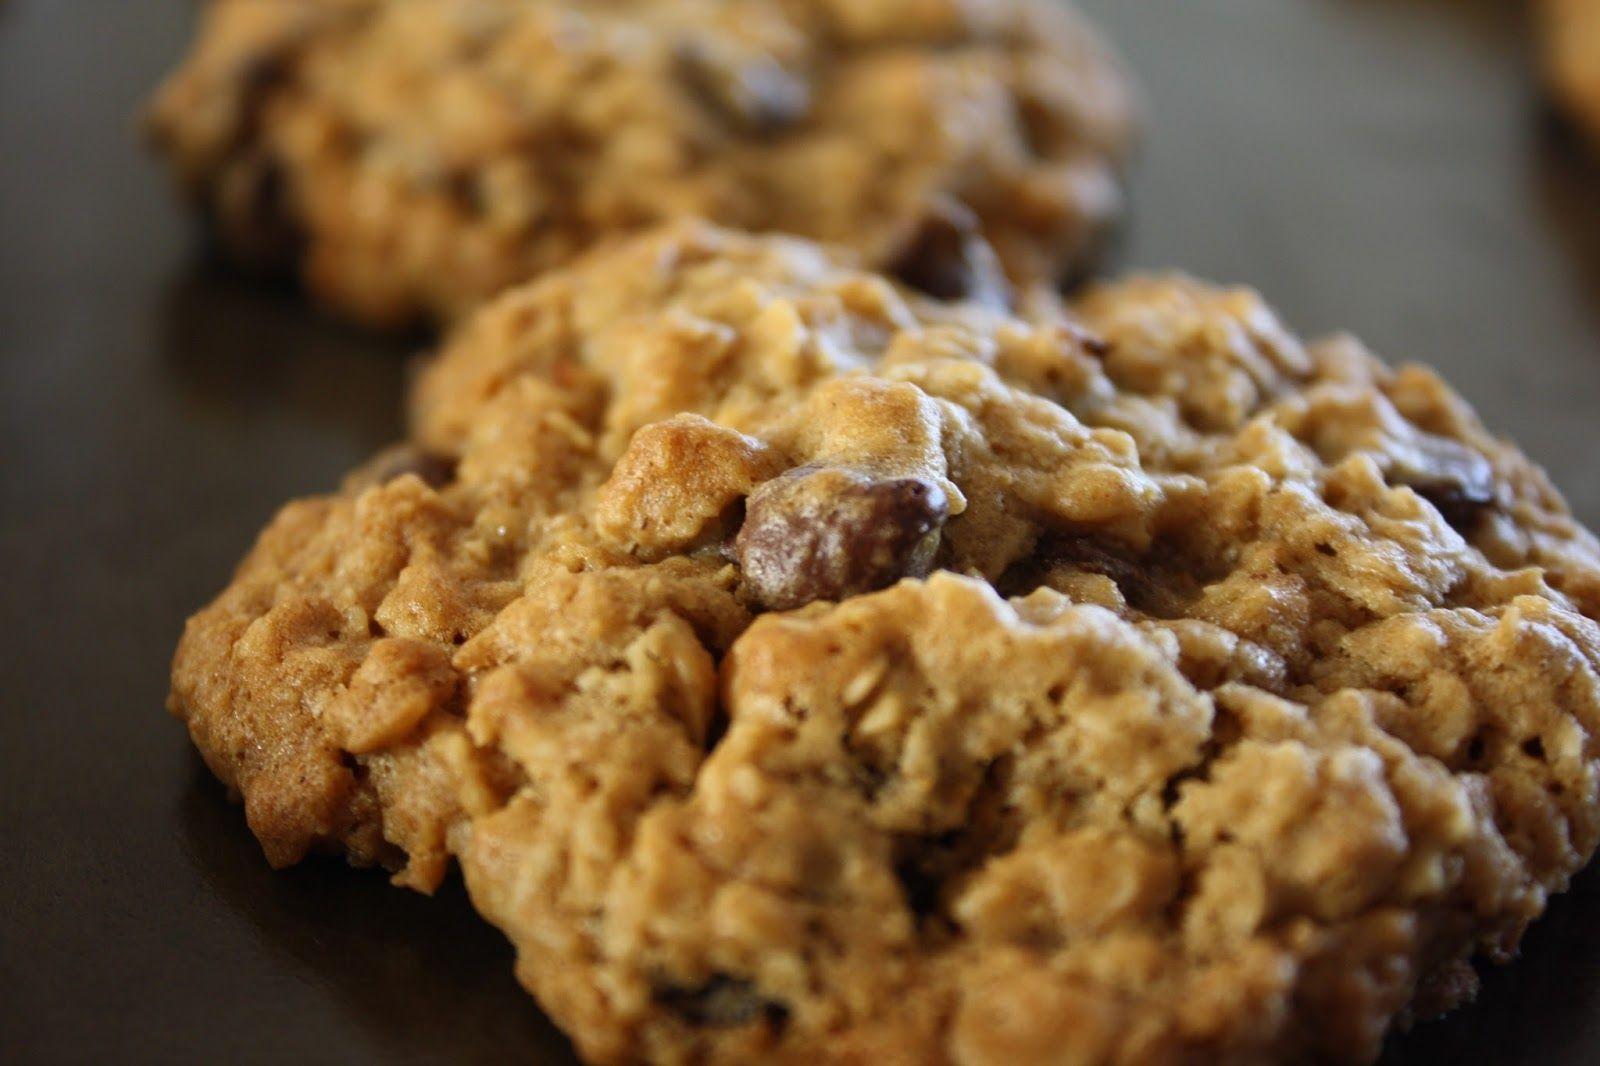 Peachy Keen Mumma Soft Amp Chewy Oatmeal Chocolate Chip